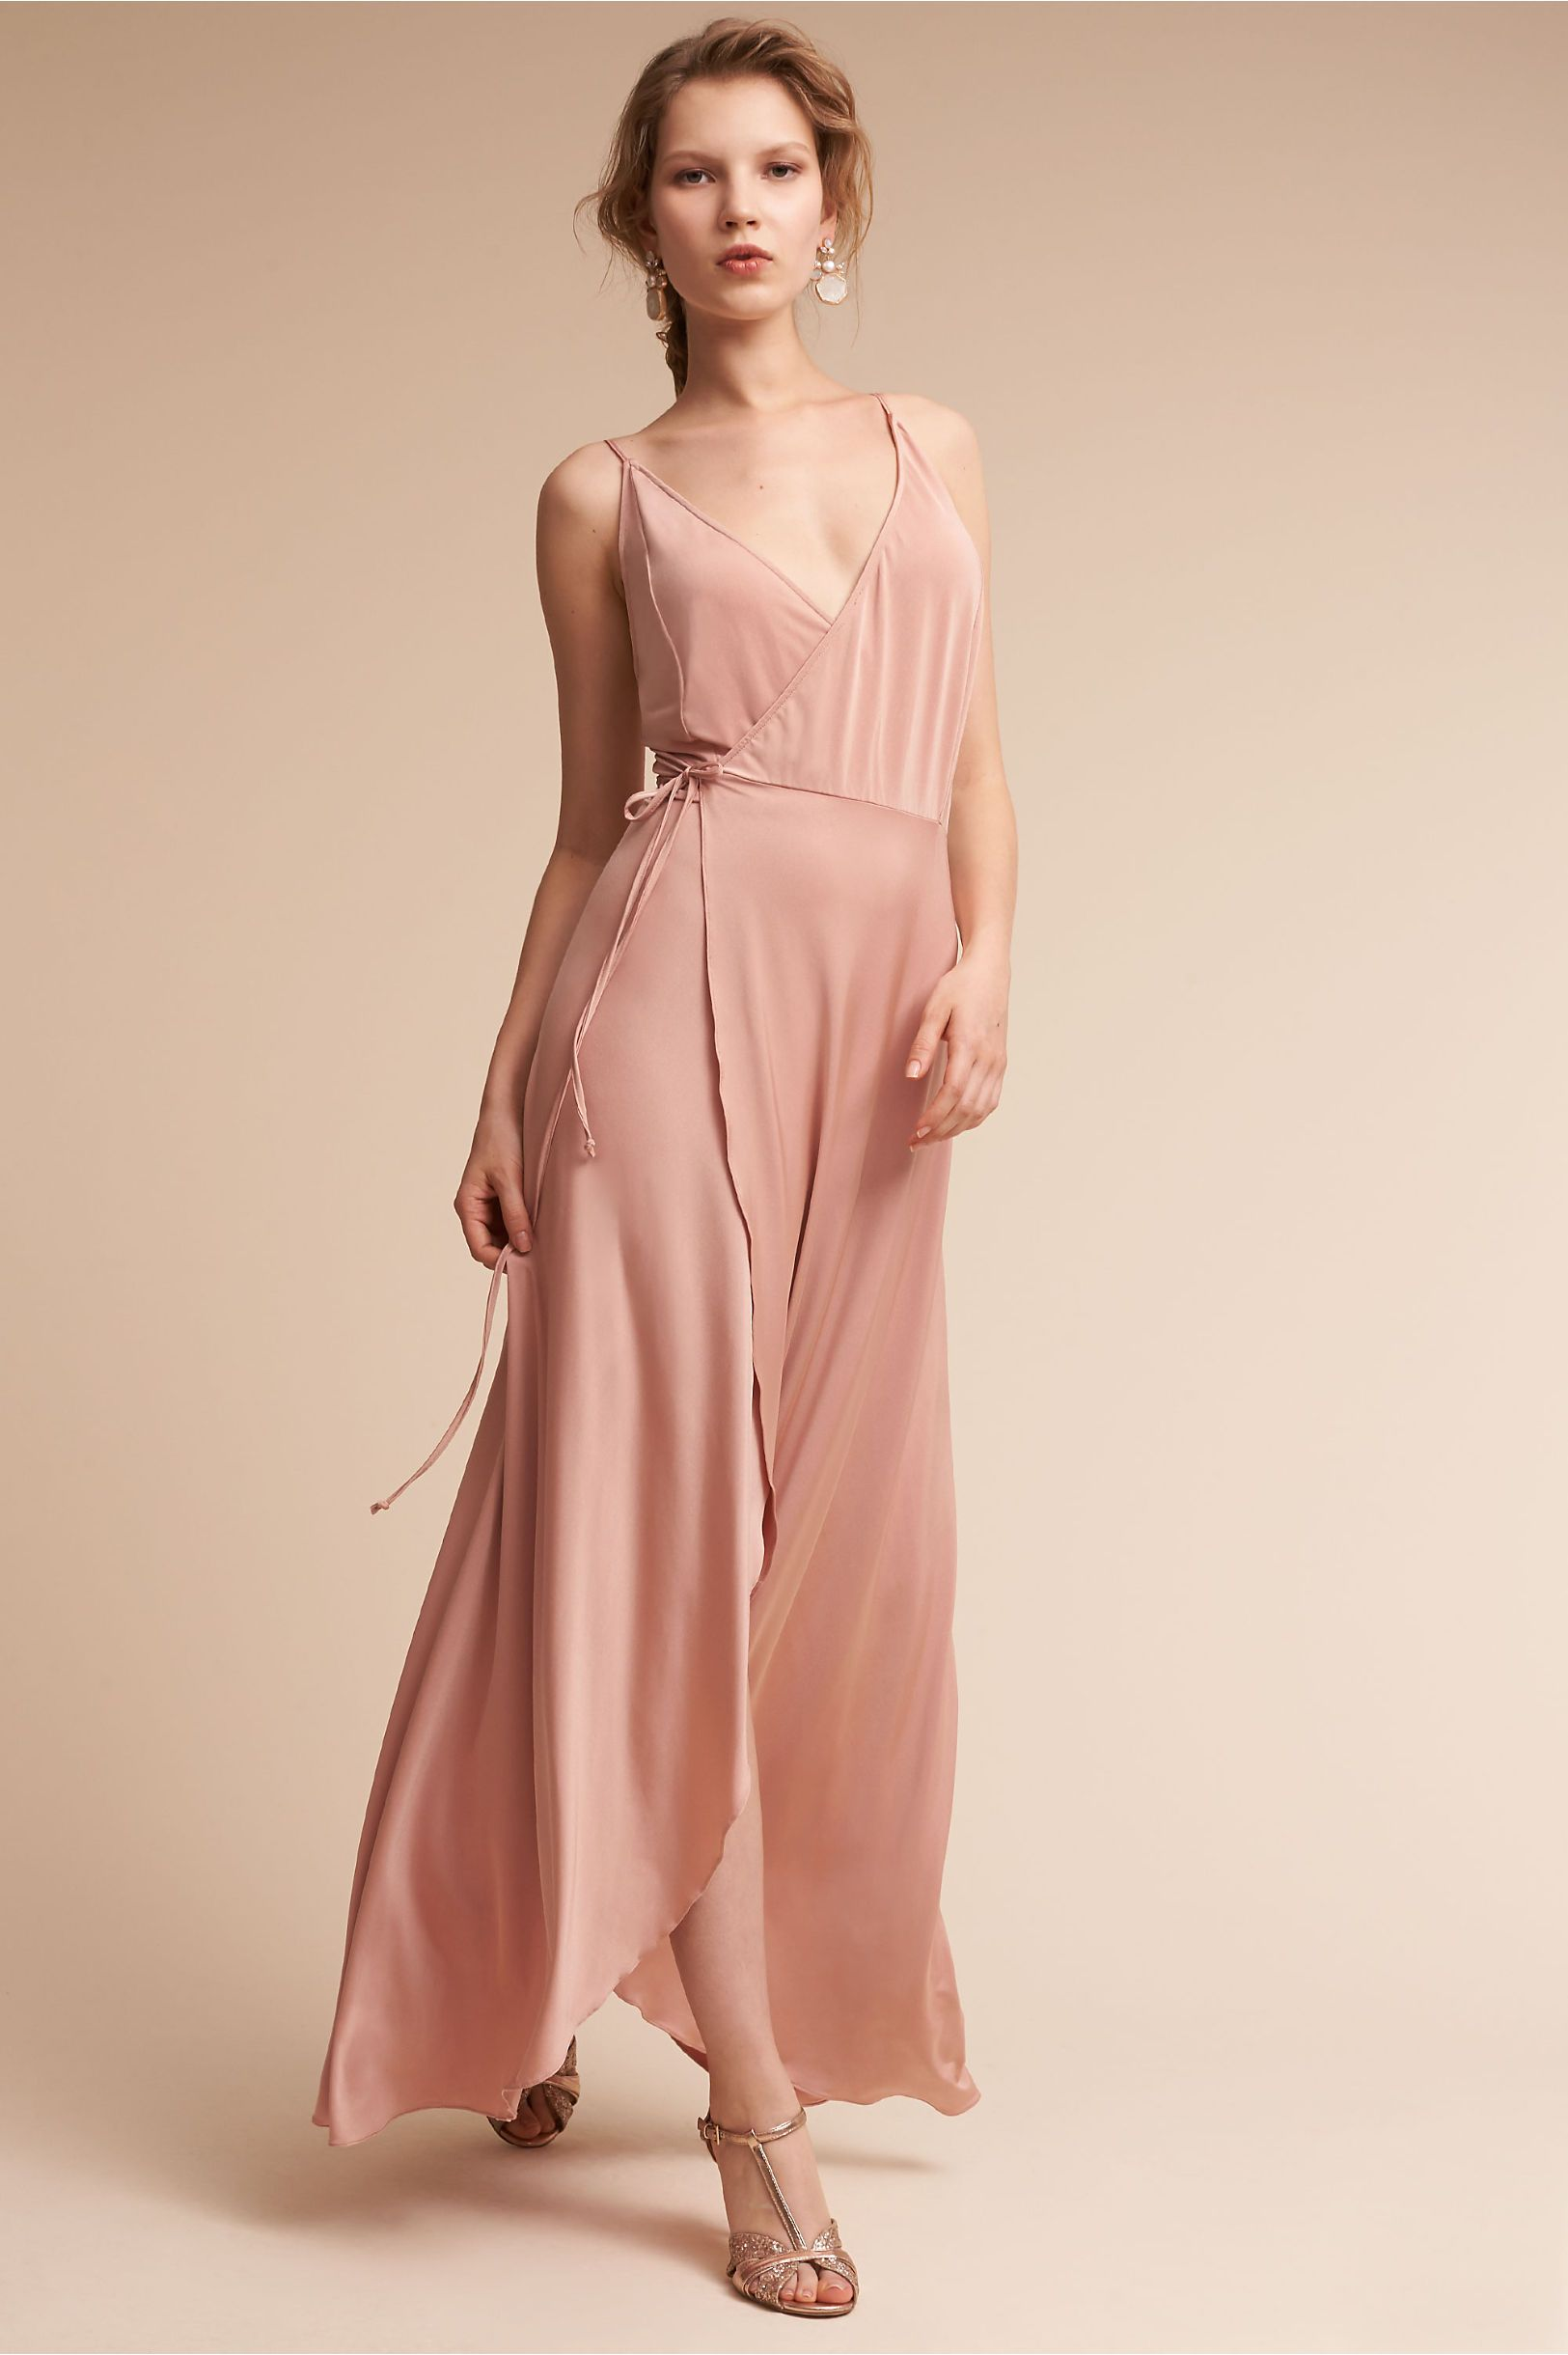 abde13392b3  255 BHLDN Lily Dress in Bridal Party